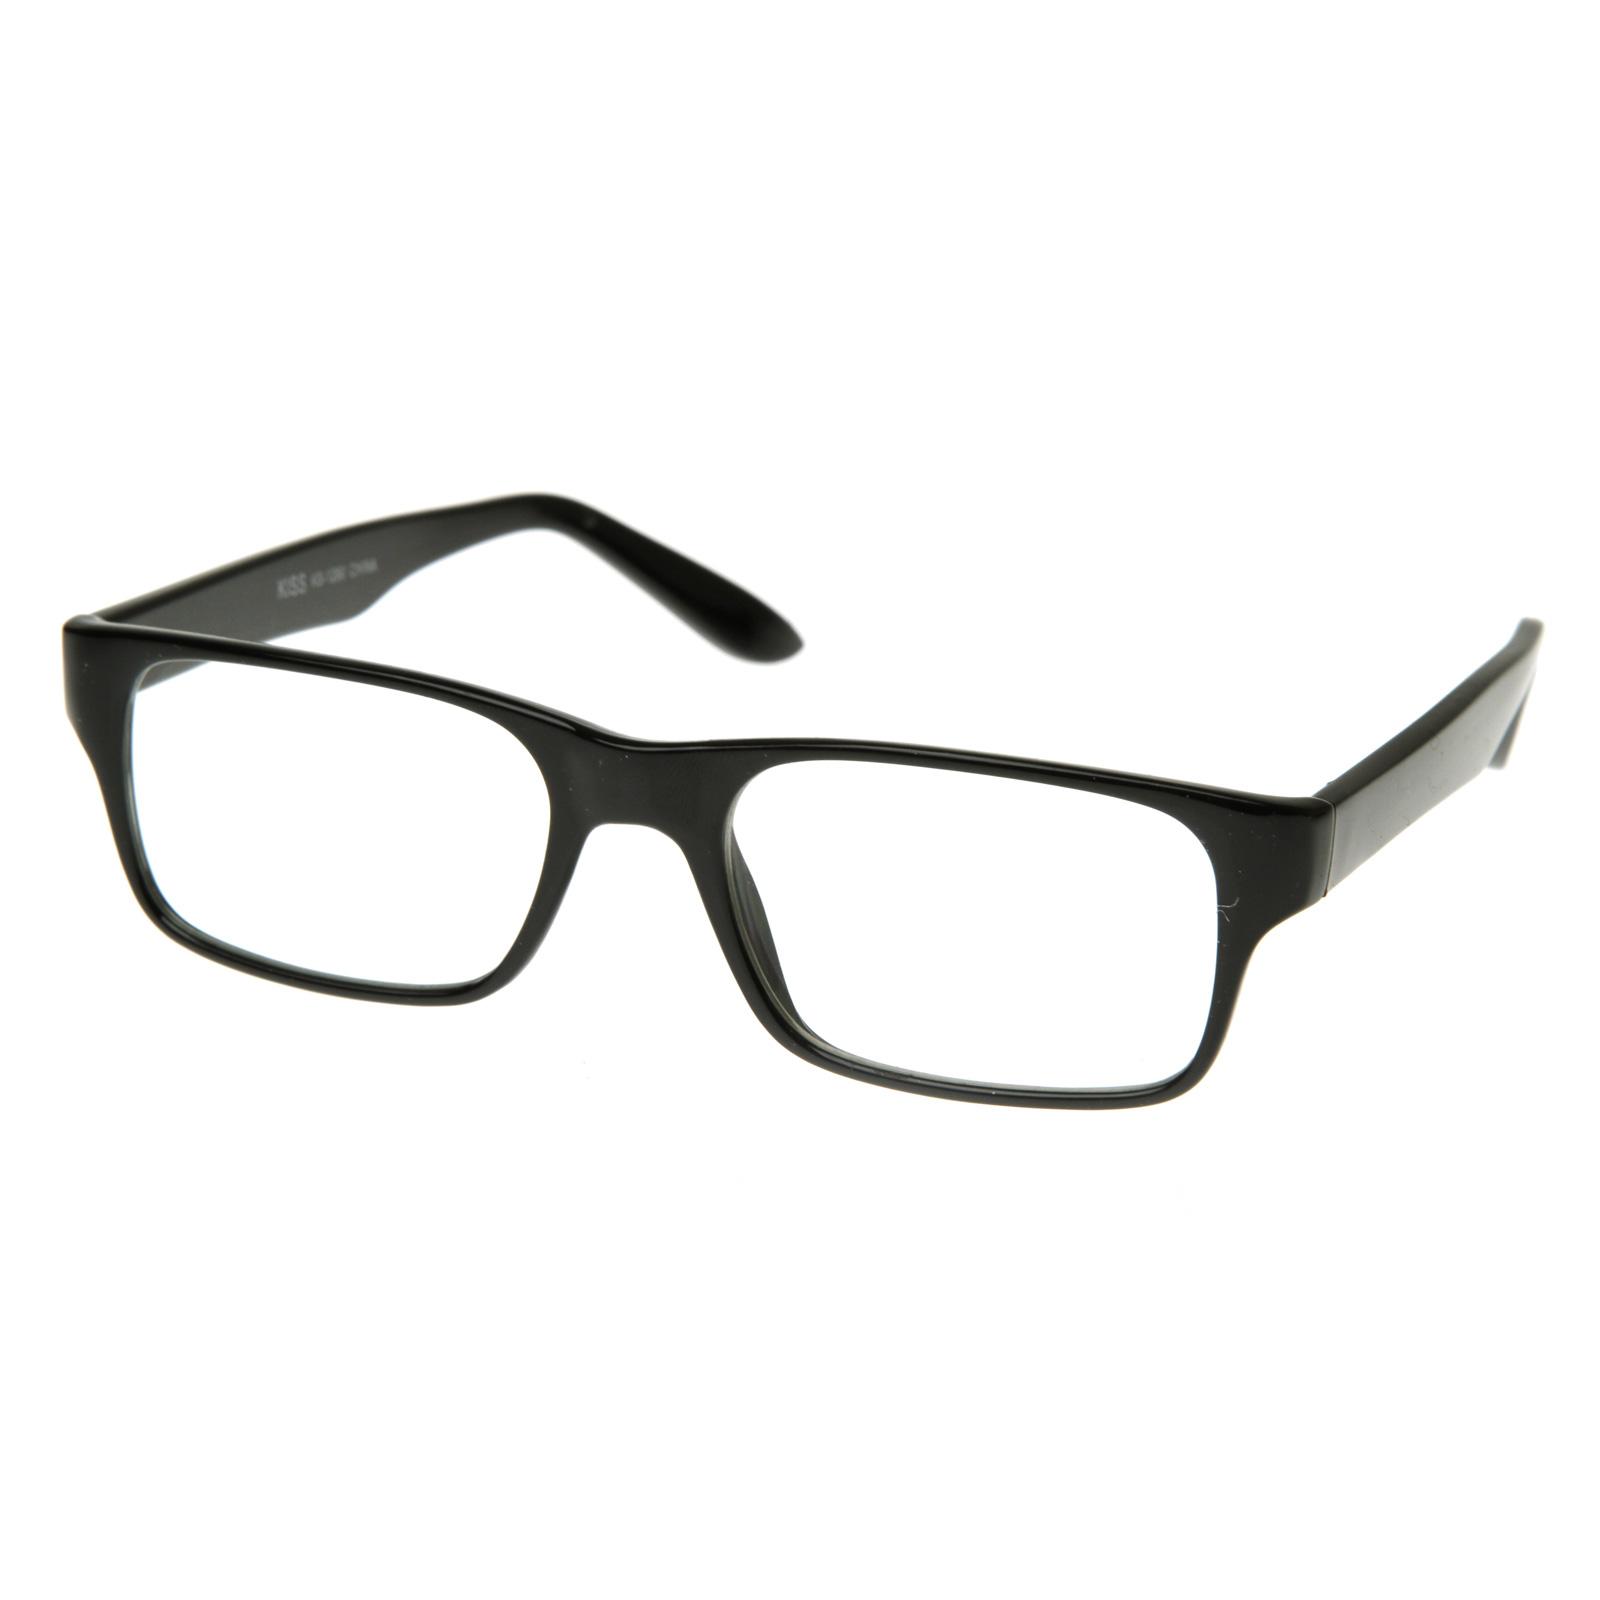 Eyeglasses Thin Frame : Thin Premium RX Optical Fream Square Clear Lens Optical ...